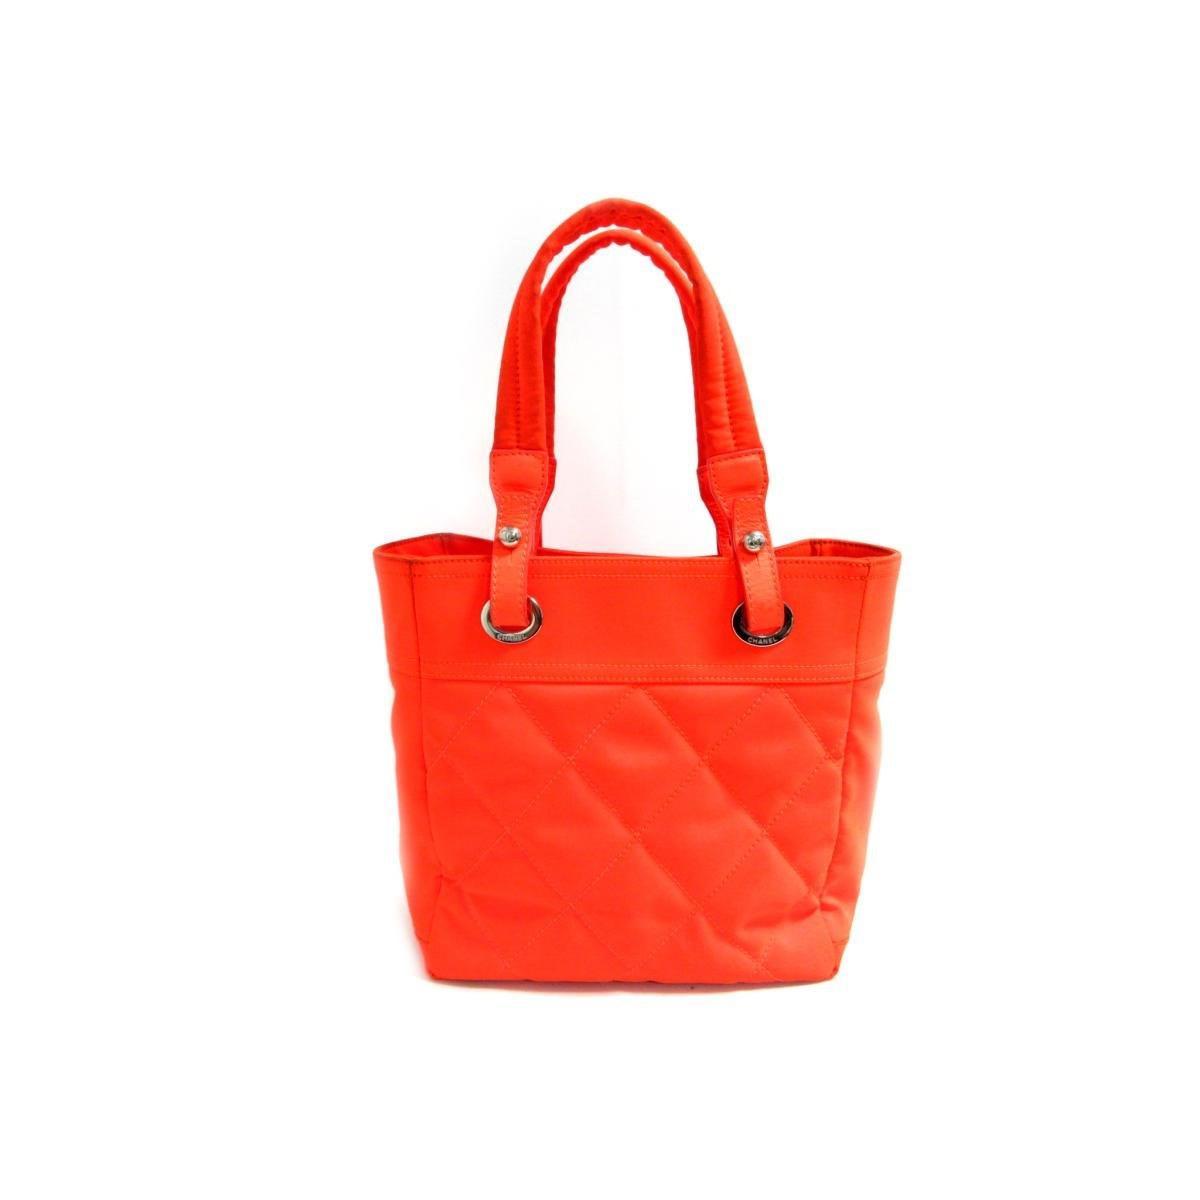 0918bb9580582c Chanel Authentic Paris Biarritz Tote Pm Tote Bag Canvas X Leather ...